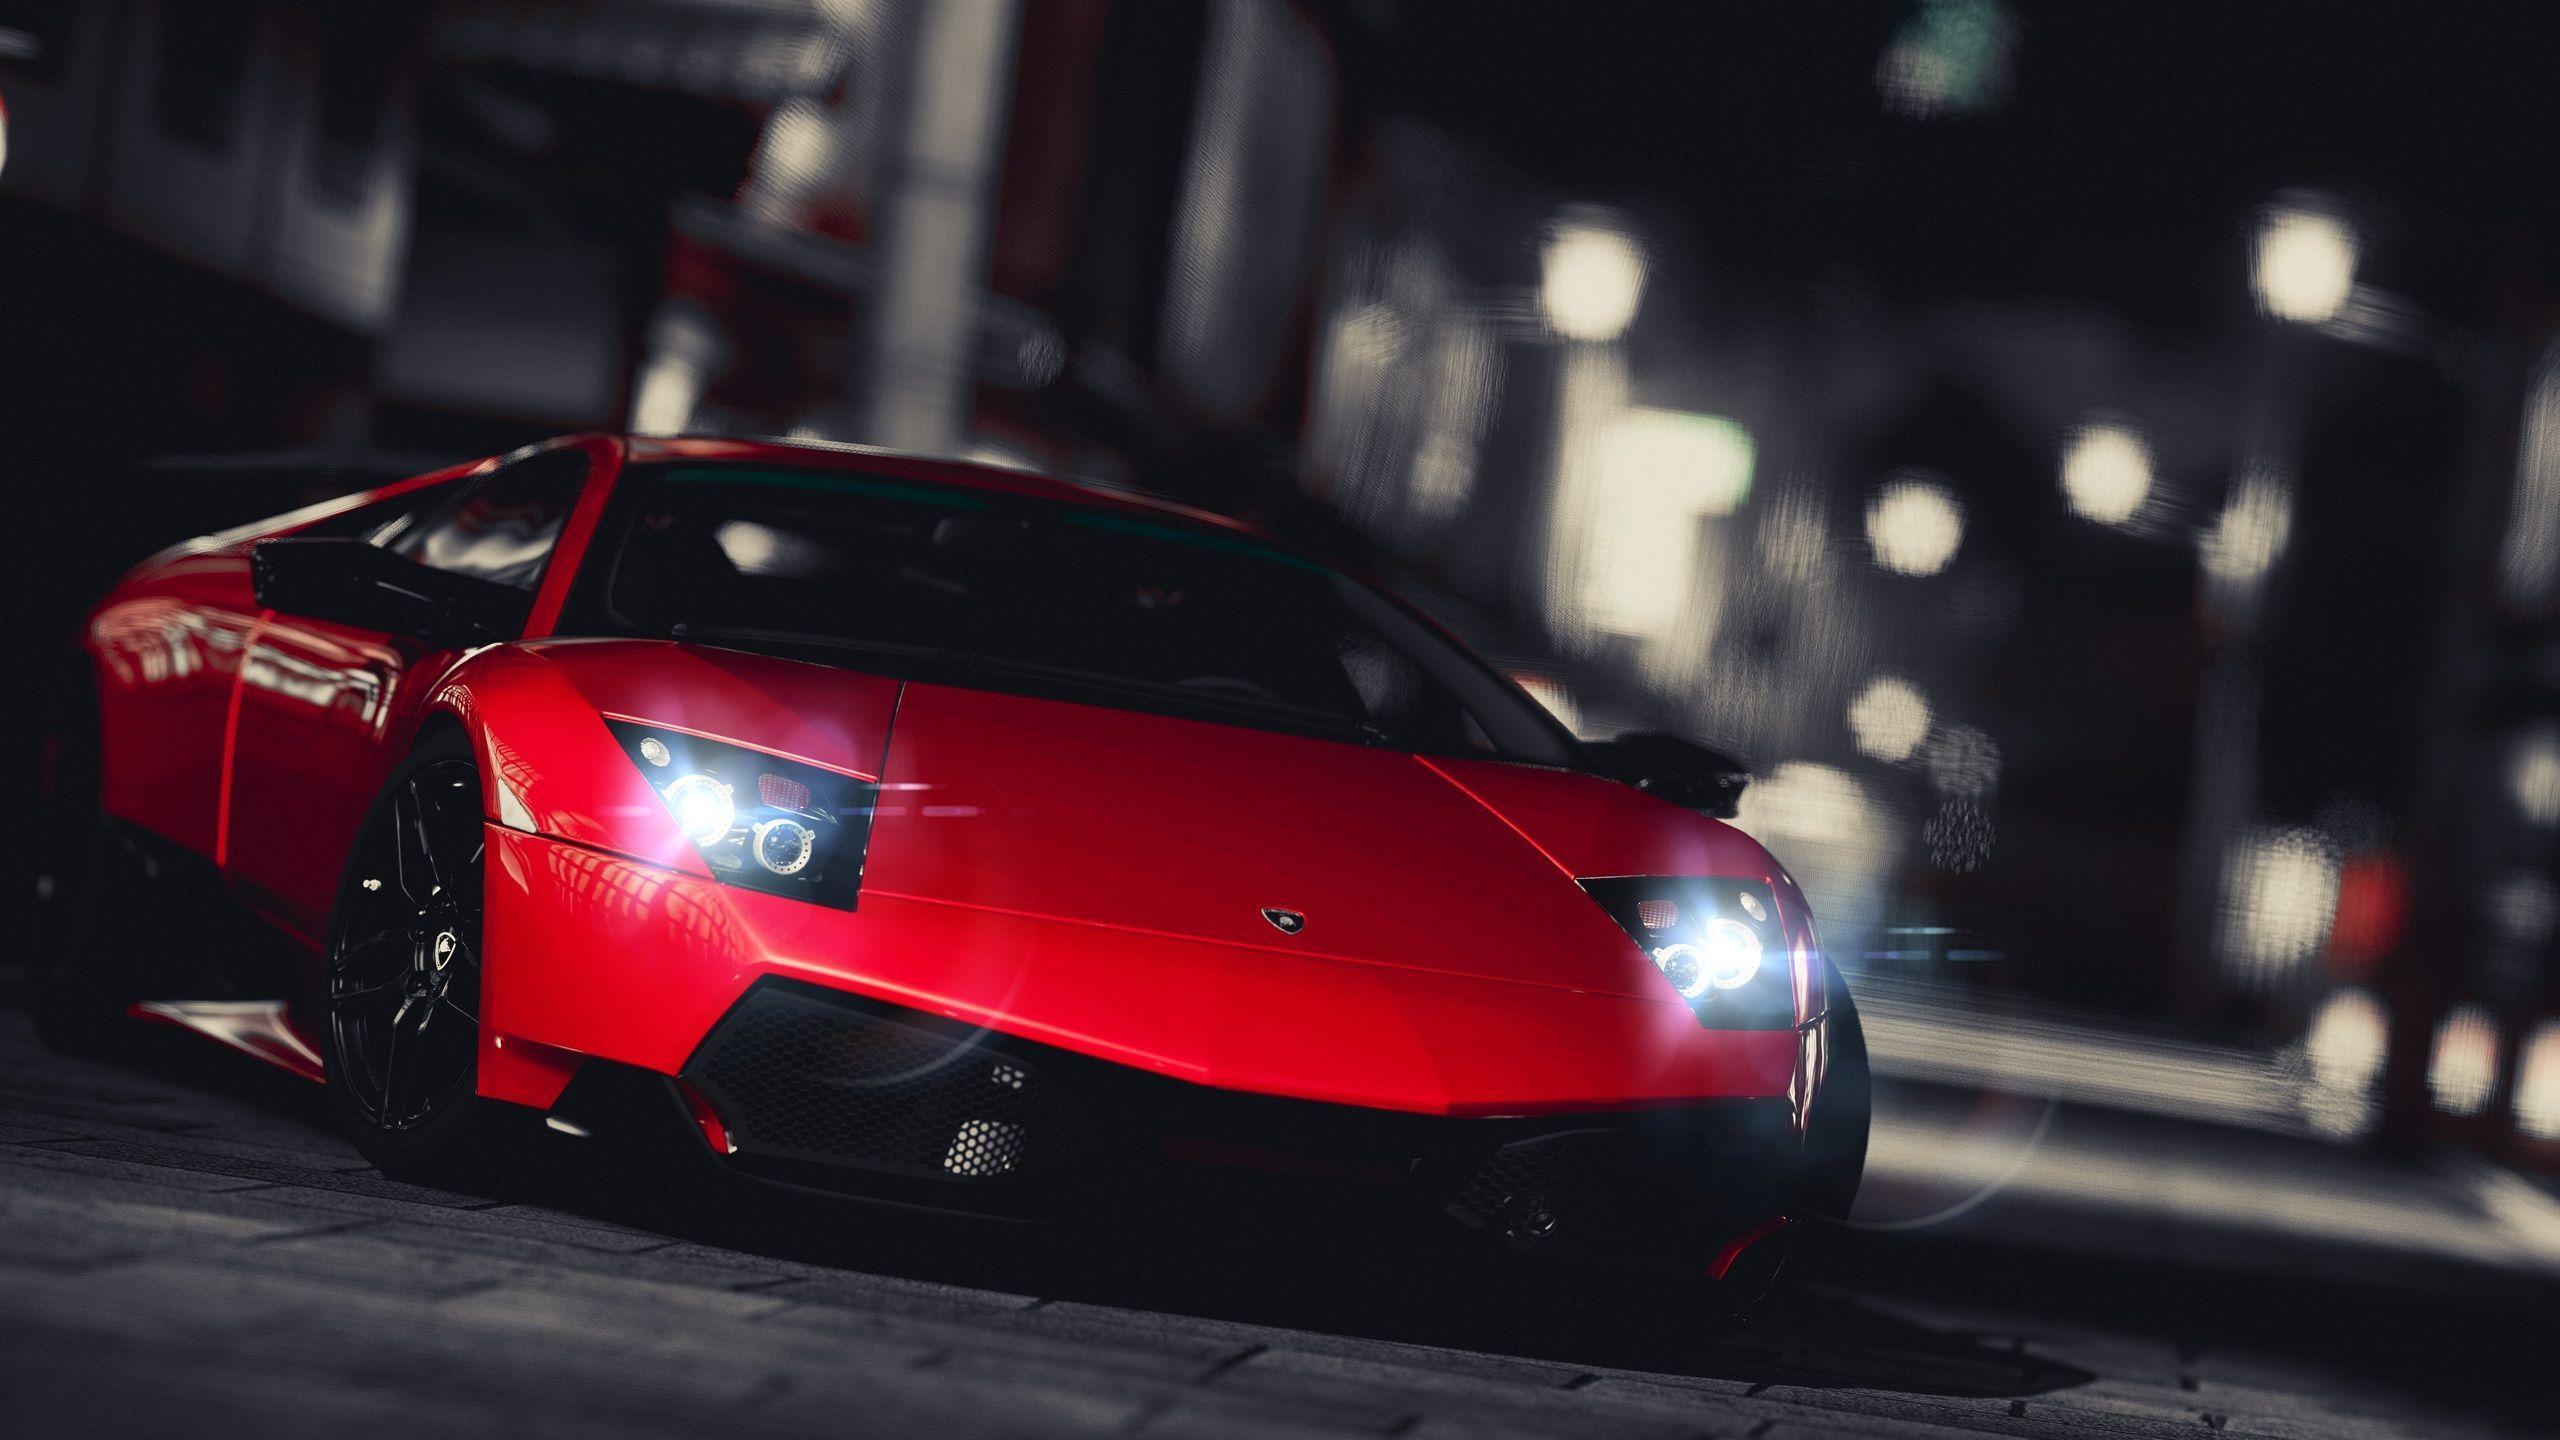 Lamborghini Night Wallpapers Wallpaper Cave